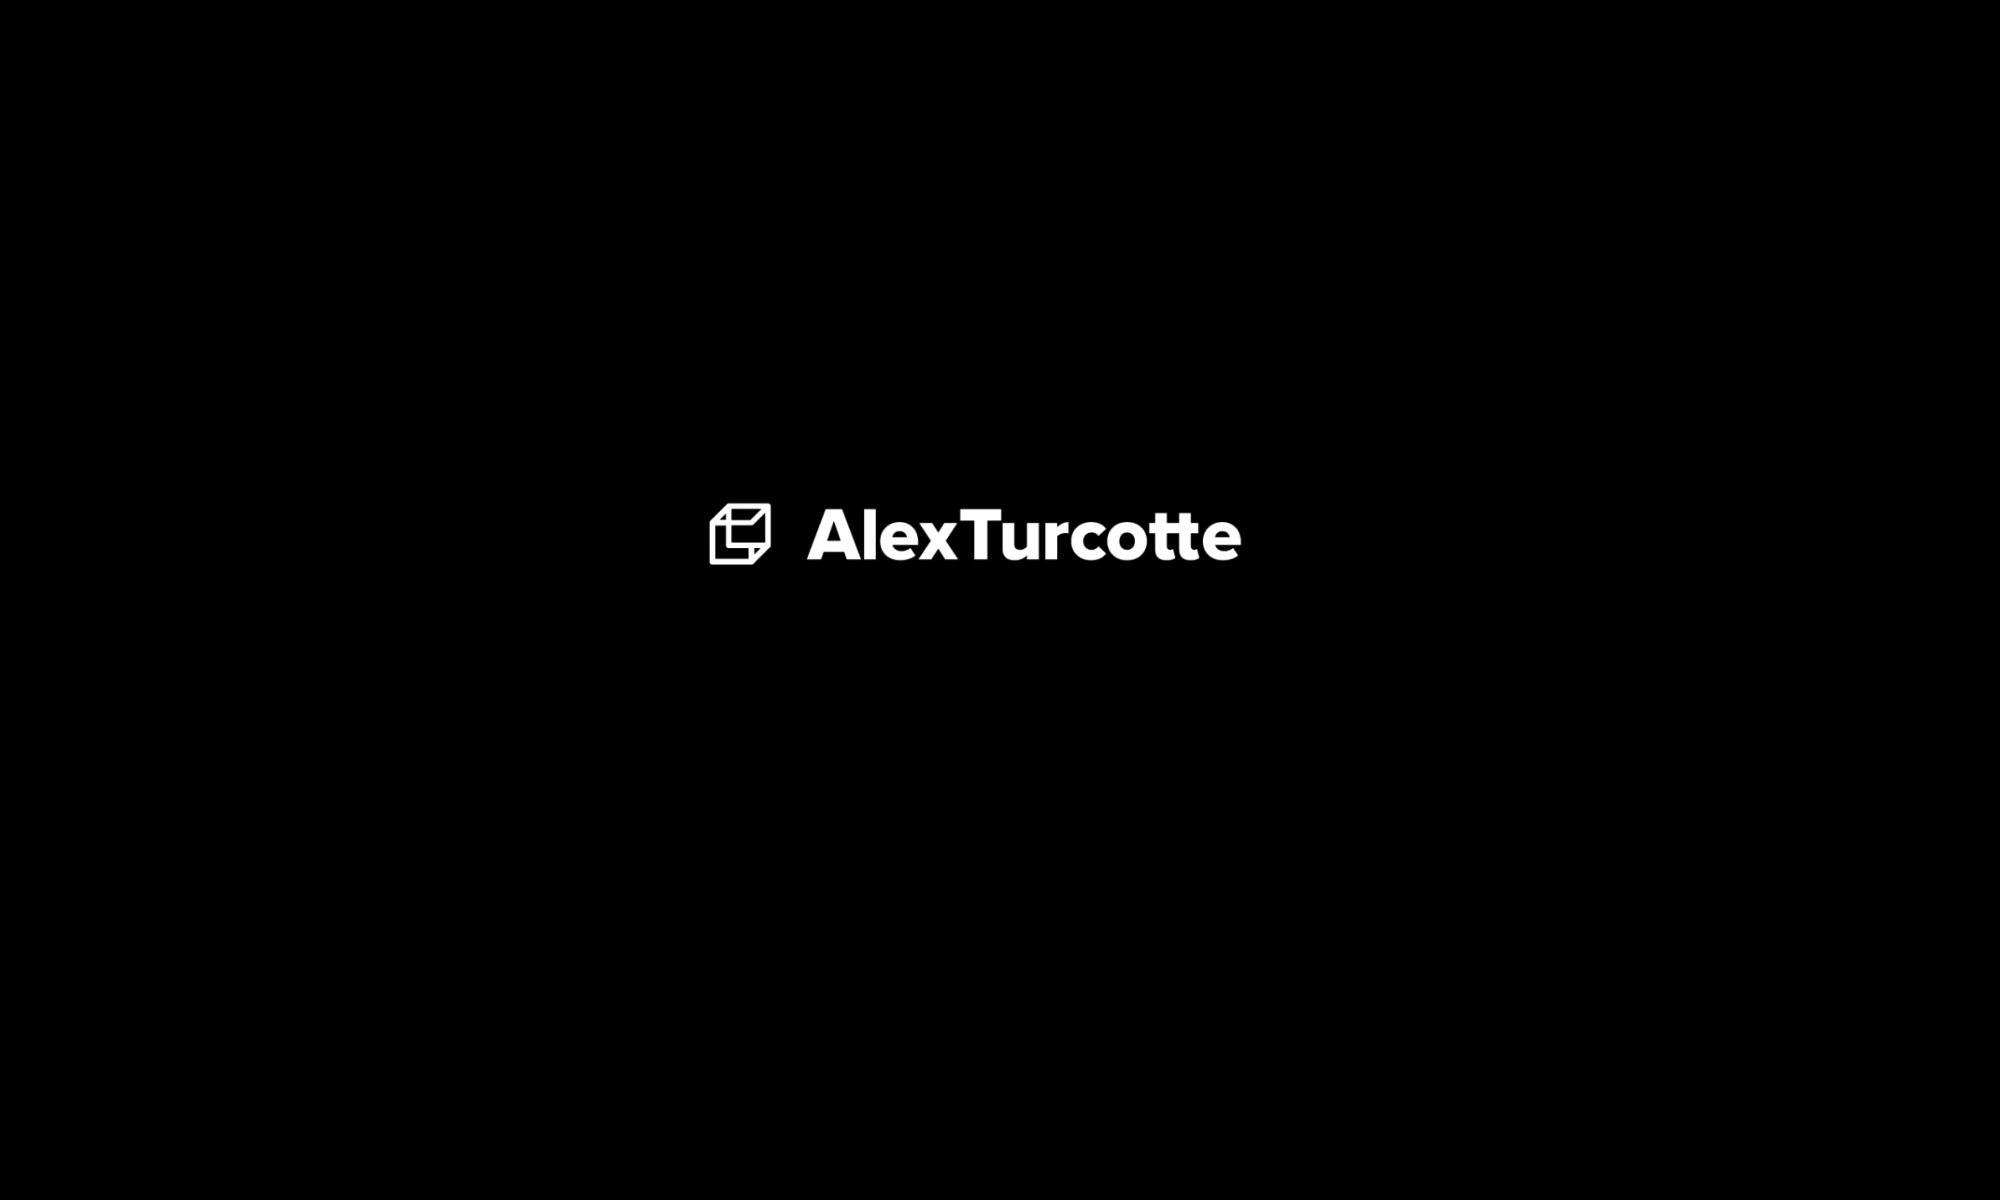 Alex Turcotte